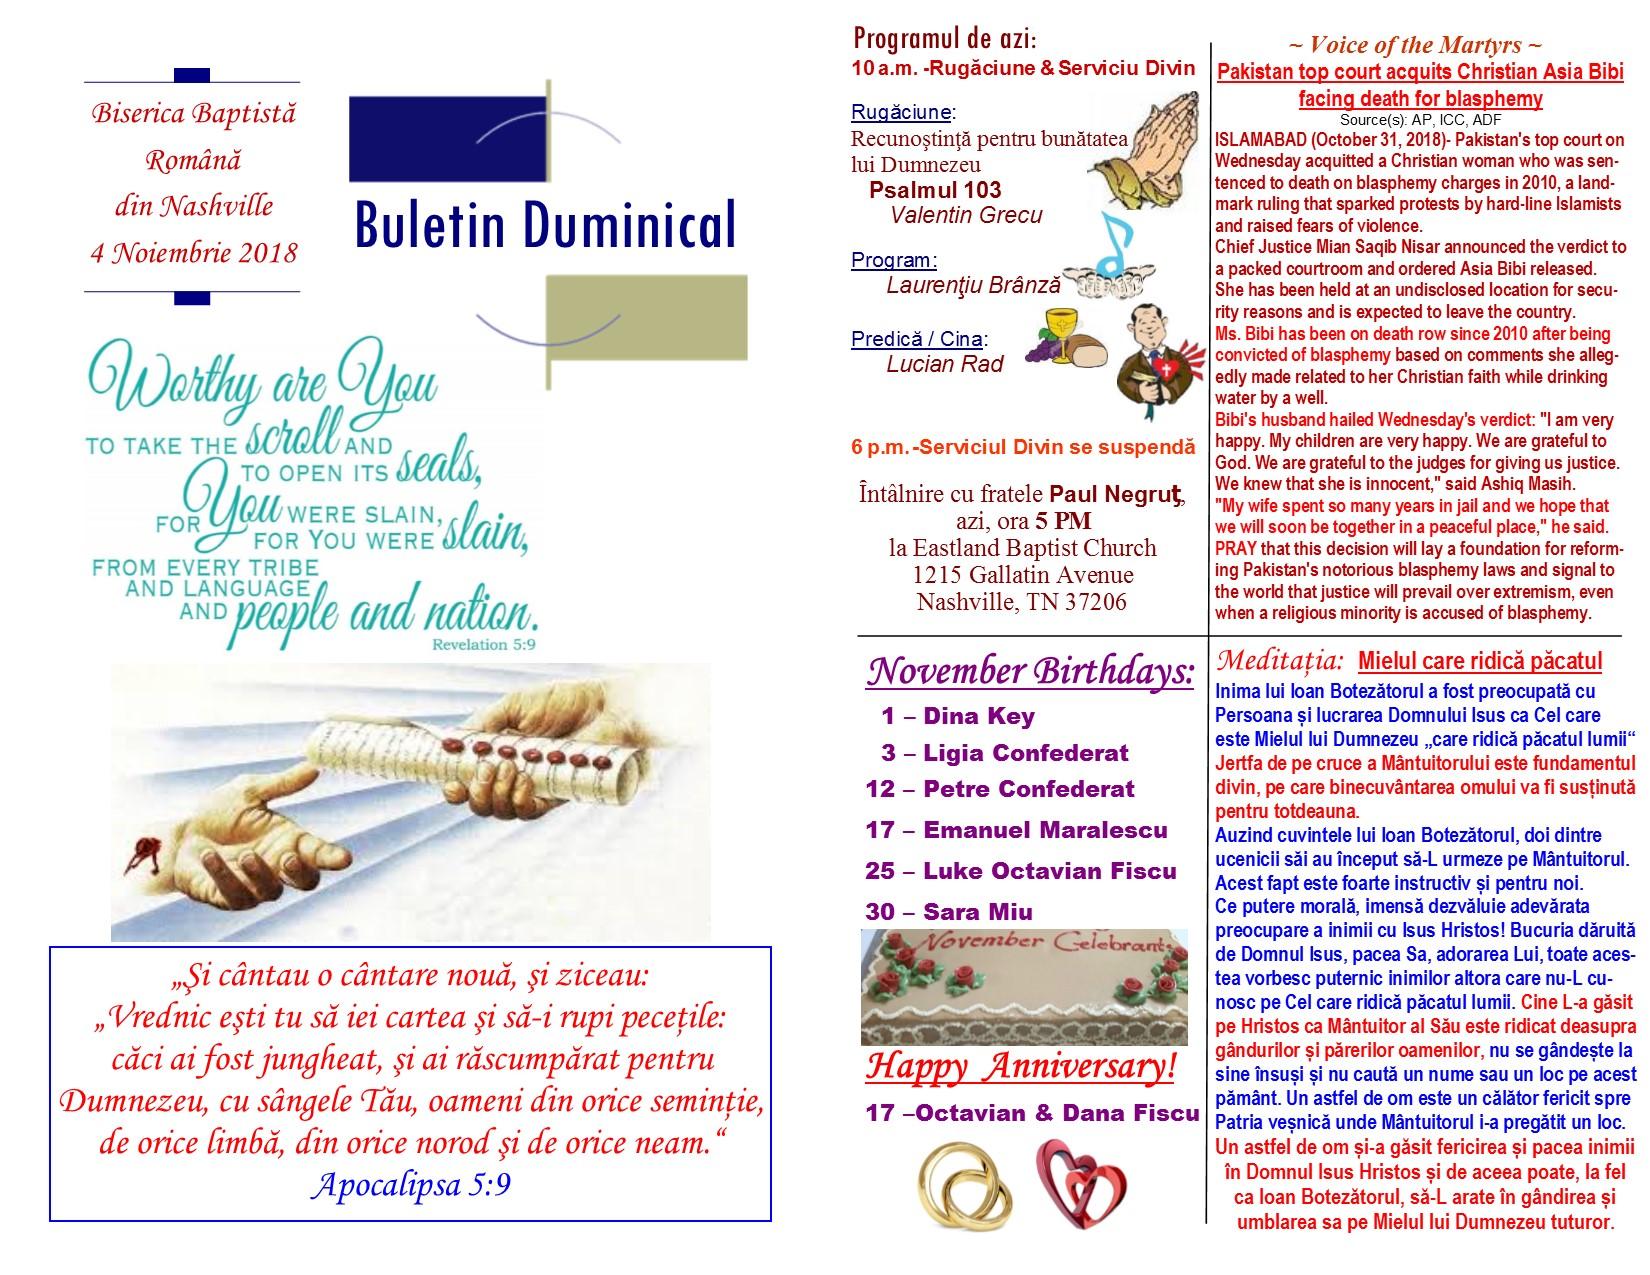 Buletin 11-04-18 page 1 & 2